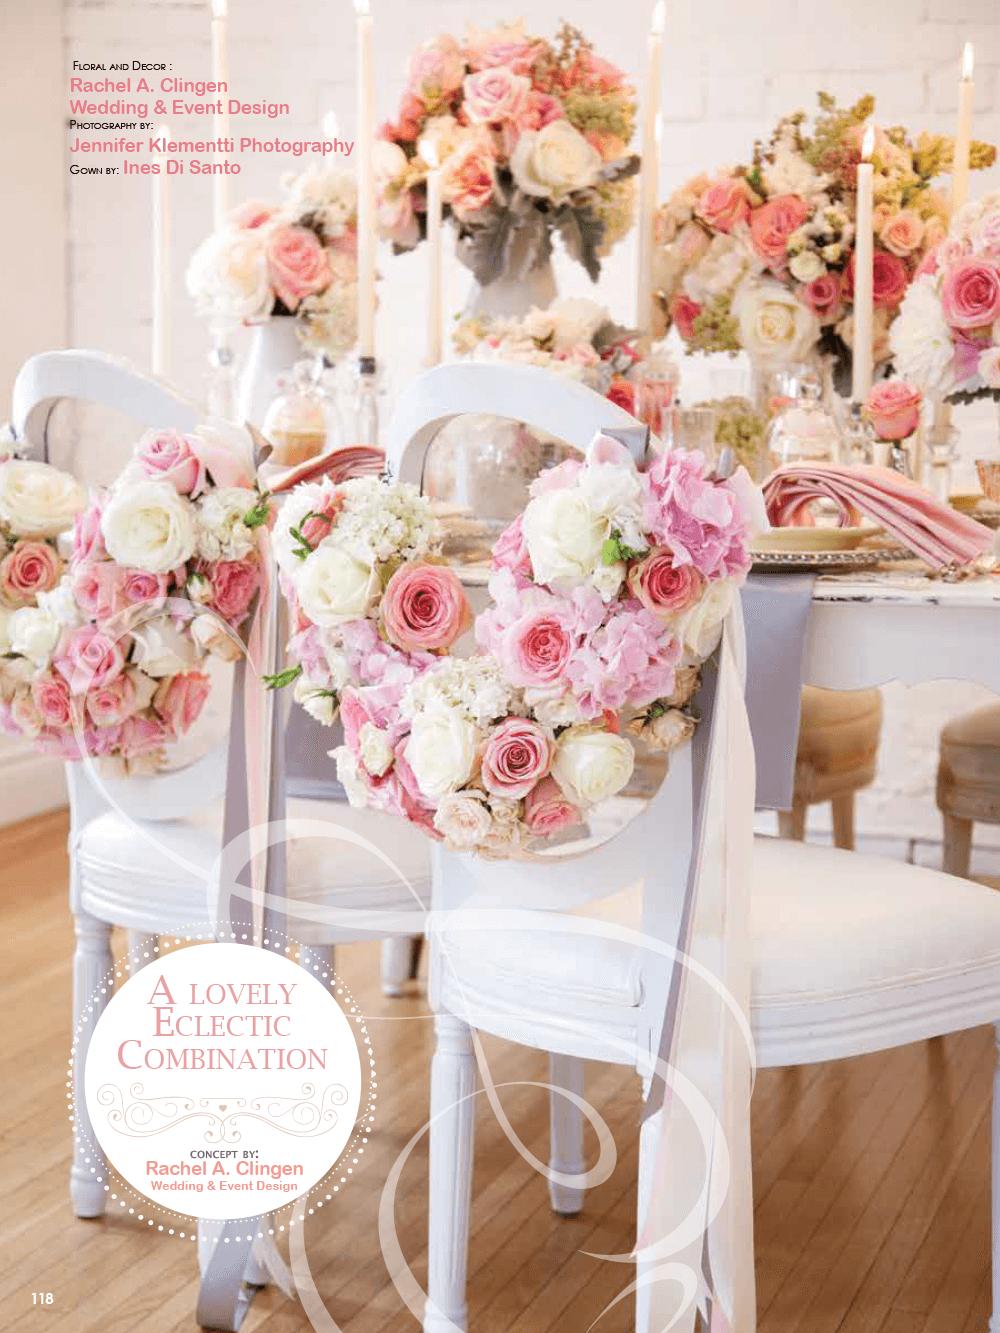 Shabby Chic Creative Styleshoot for Elegant Wedding Magazine by Rachel A. Clingen Wedding Design, Decor & Flowers